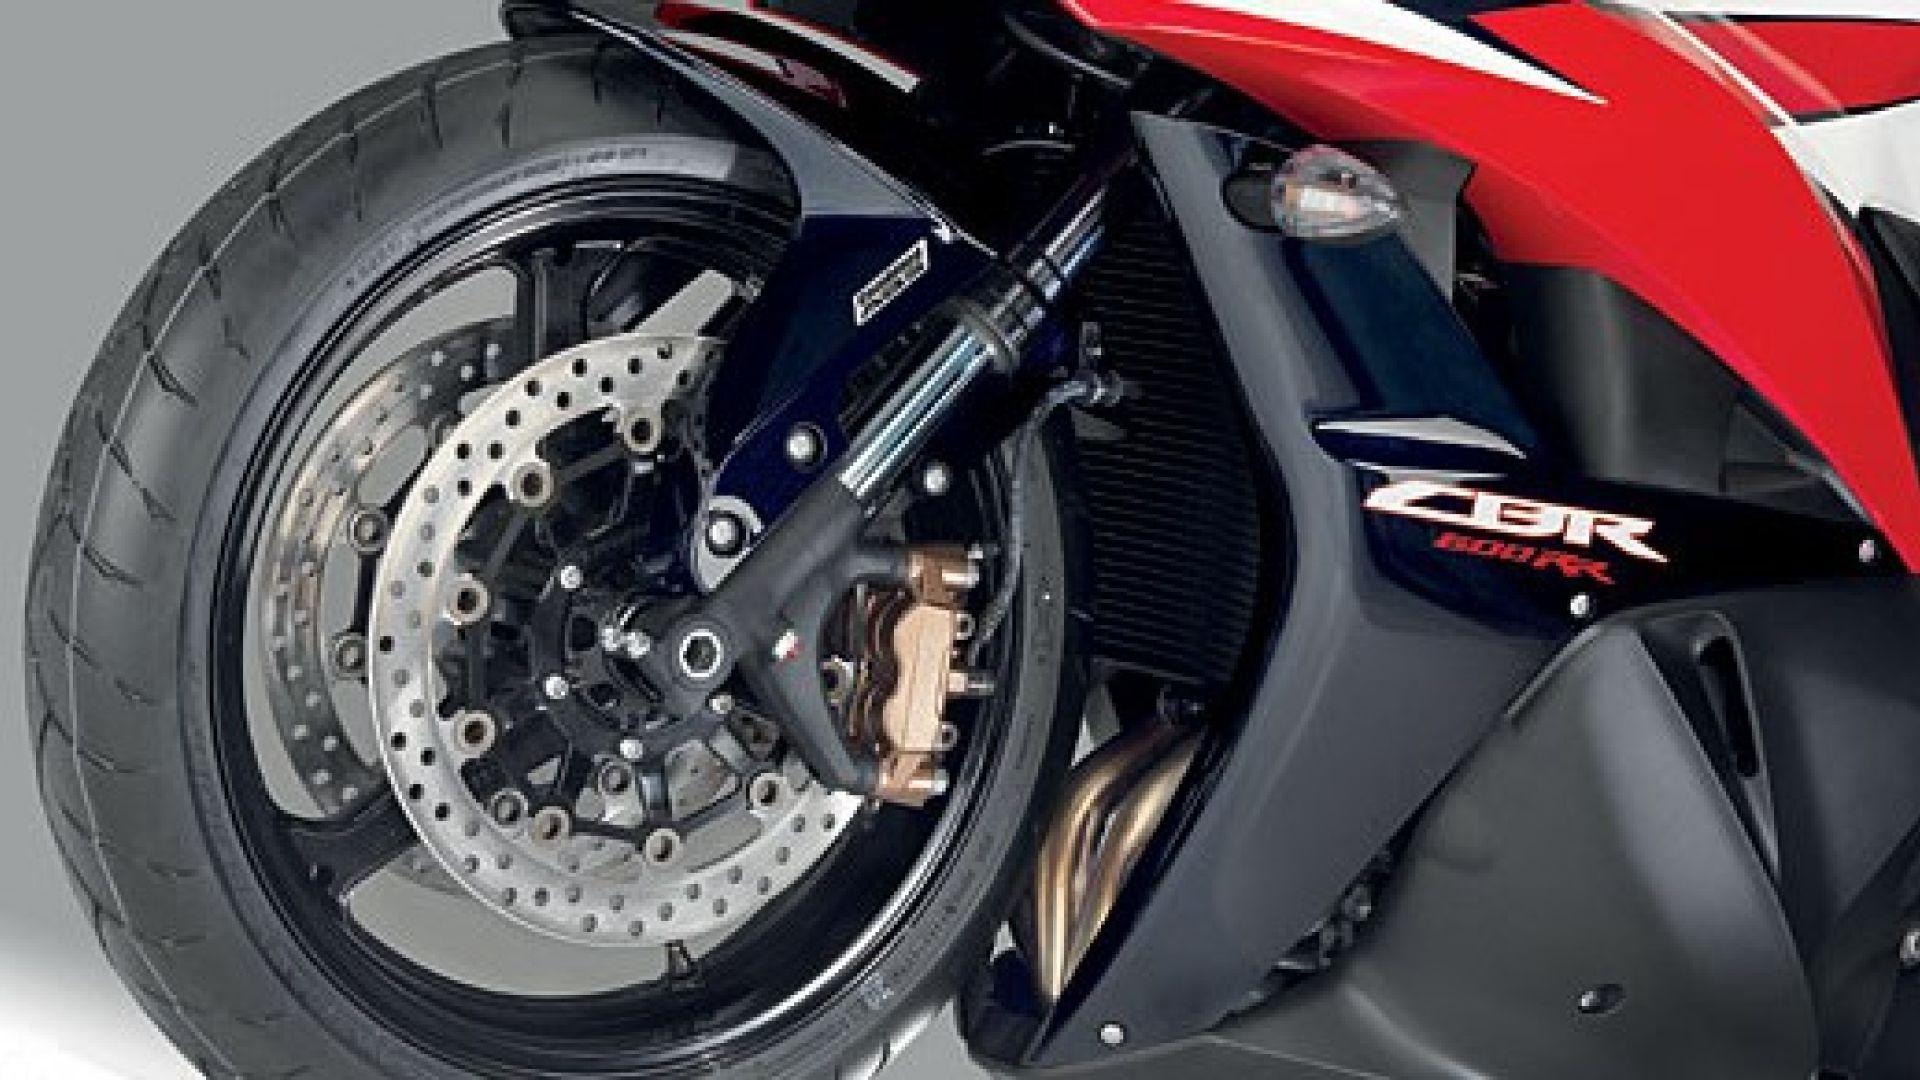 Prova Honda Cbr 600 Rr Abs Motorbox